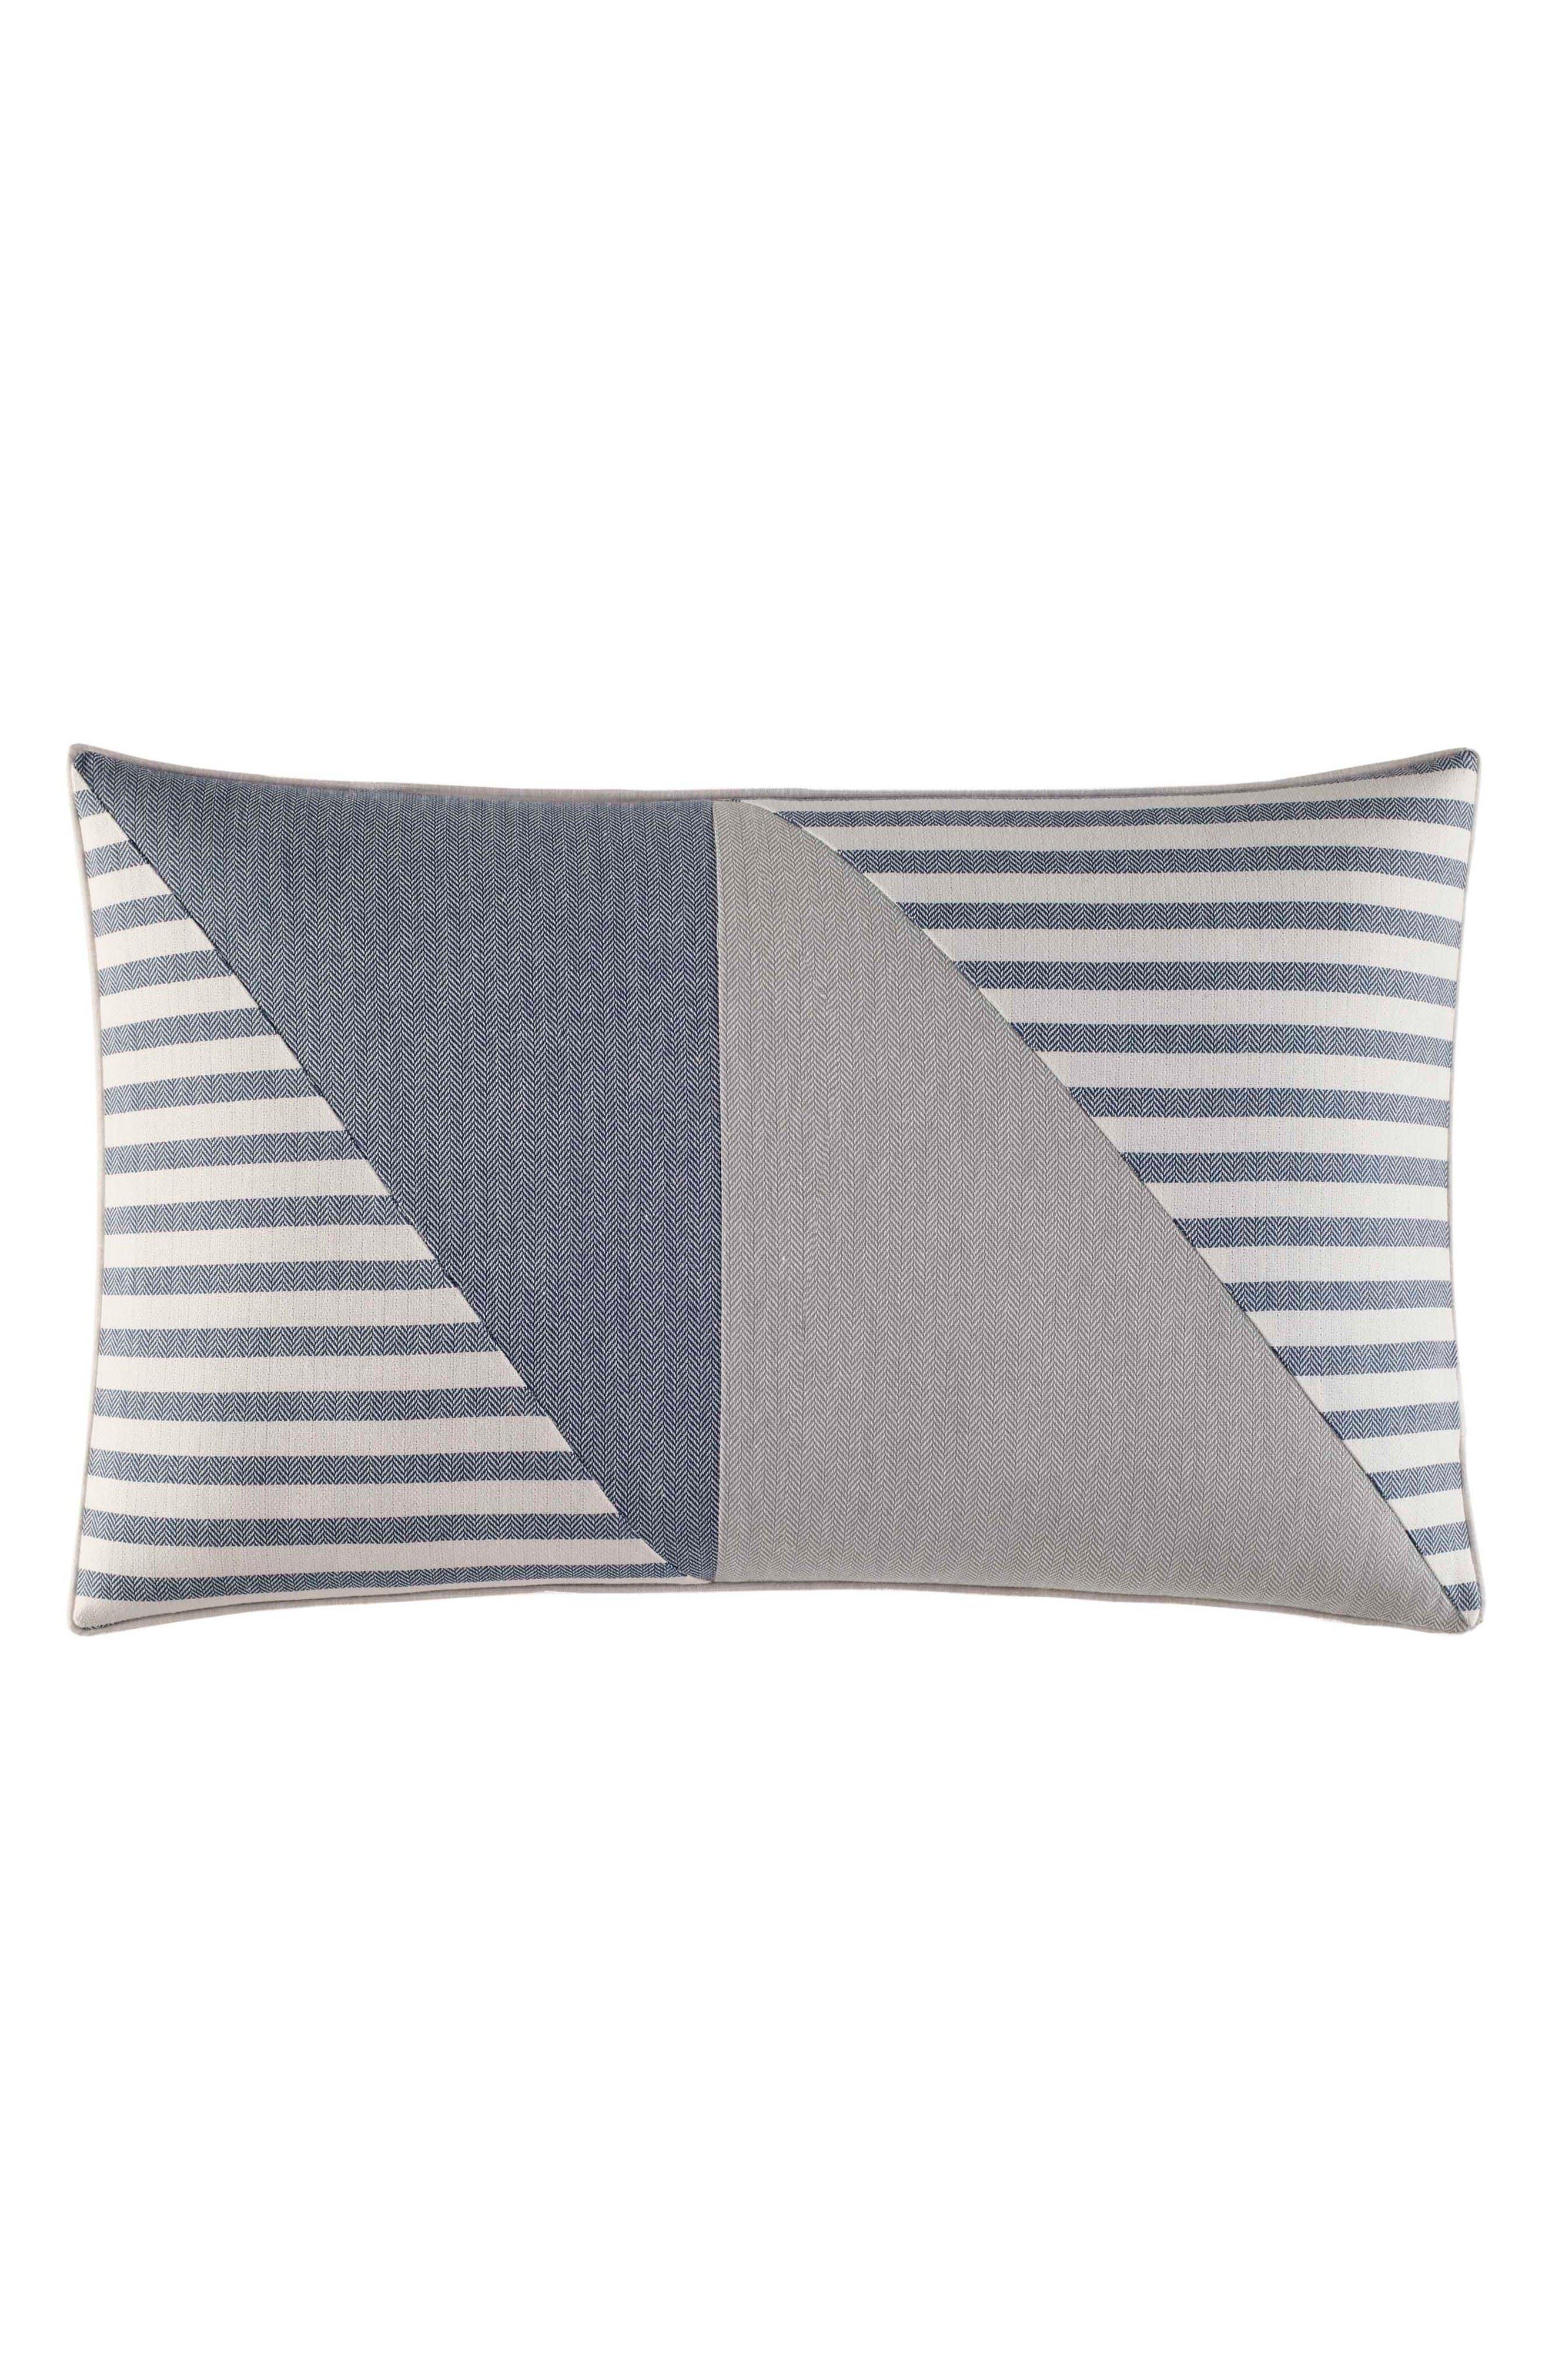 Alternate Image 1 Selected - Nautica Fairwater Pillow